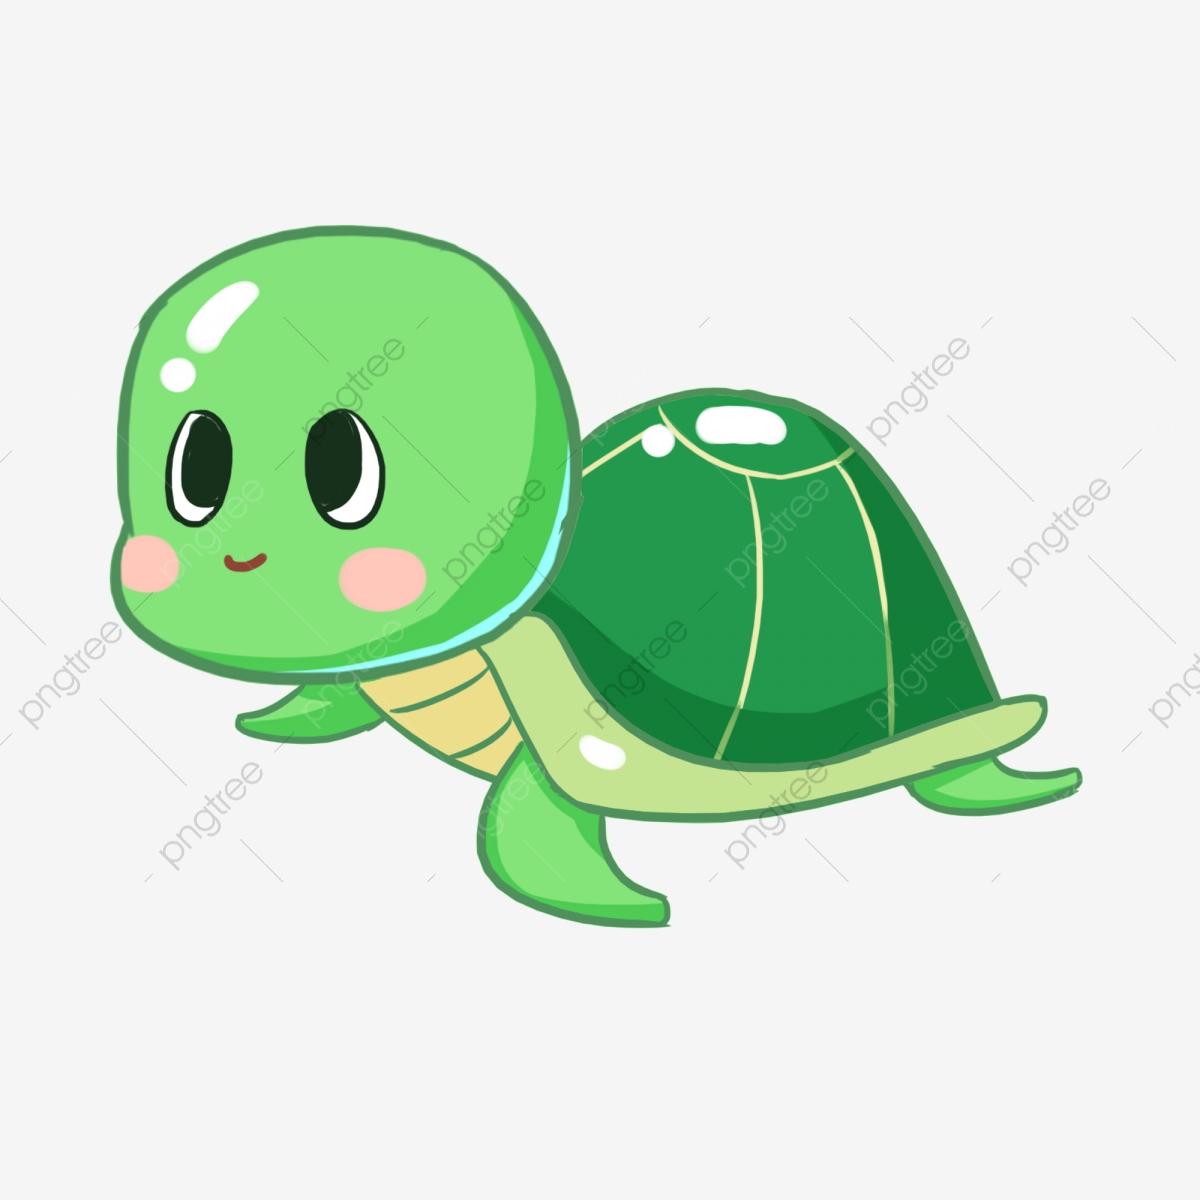 Cartoon Hand Painted Cute Little Turtle Marine Life, Green.